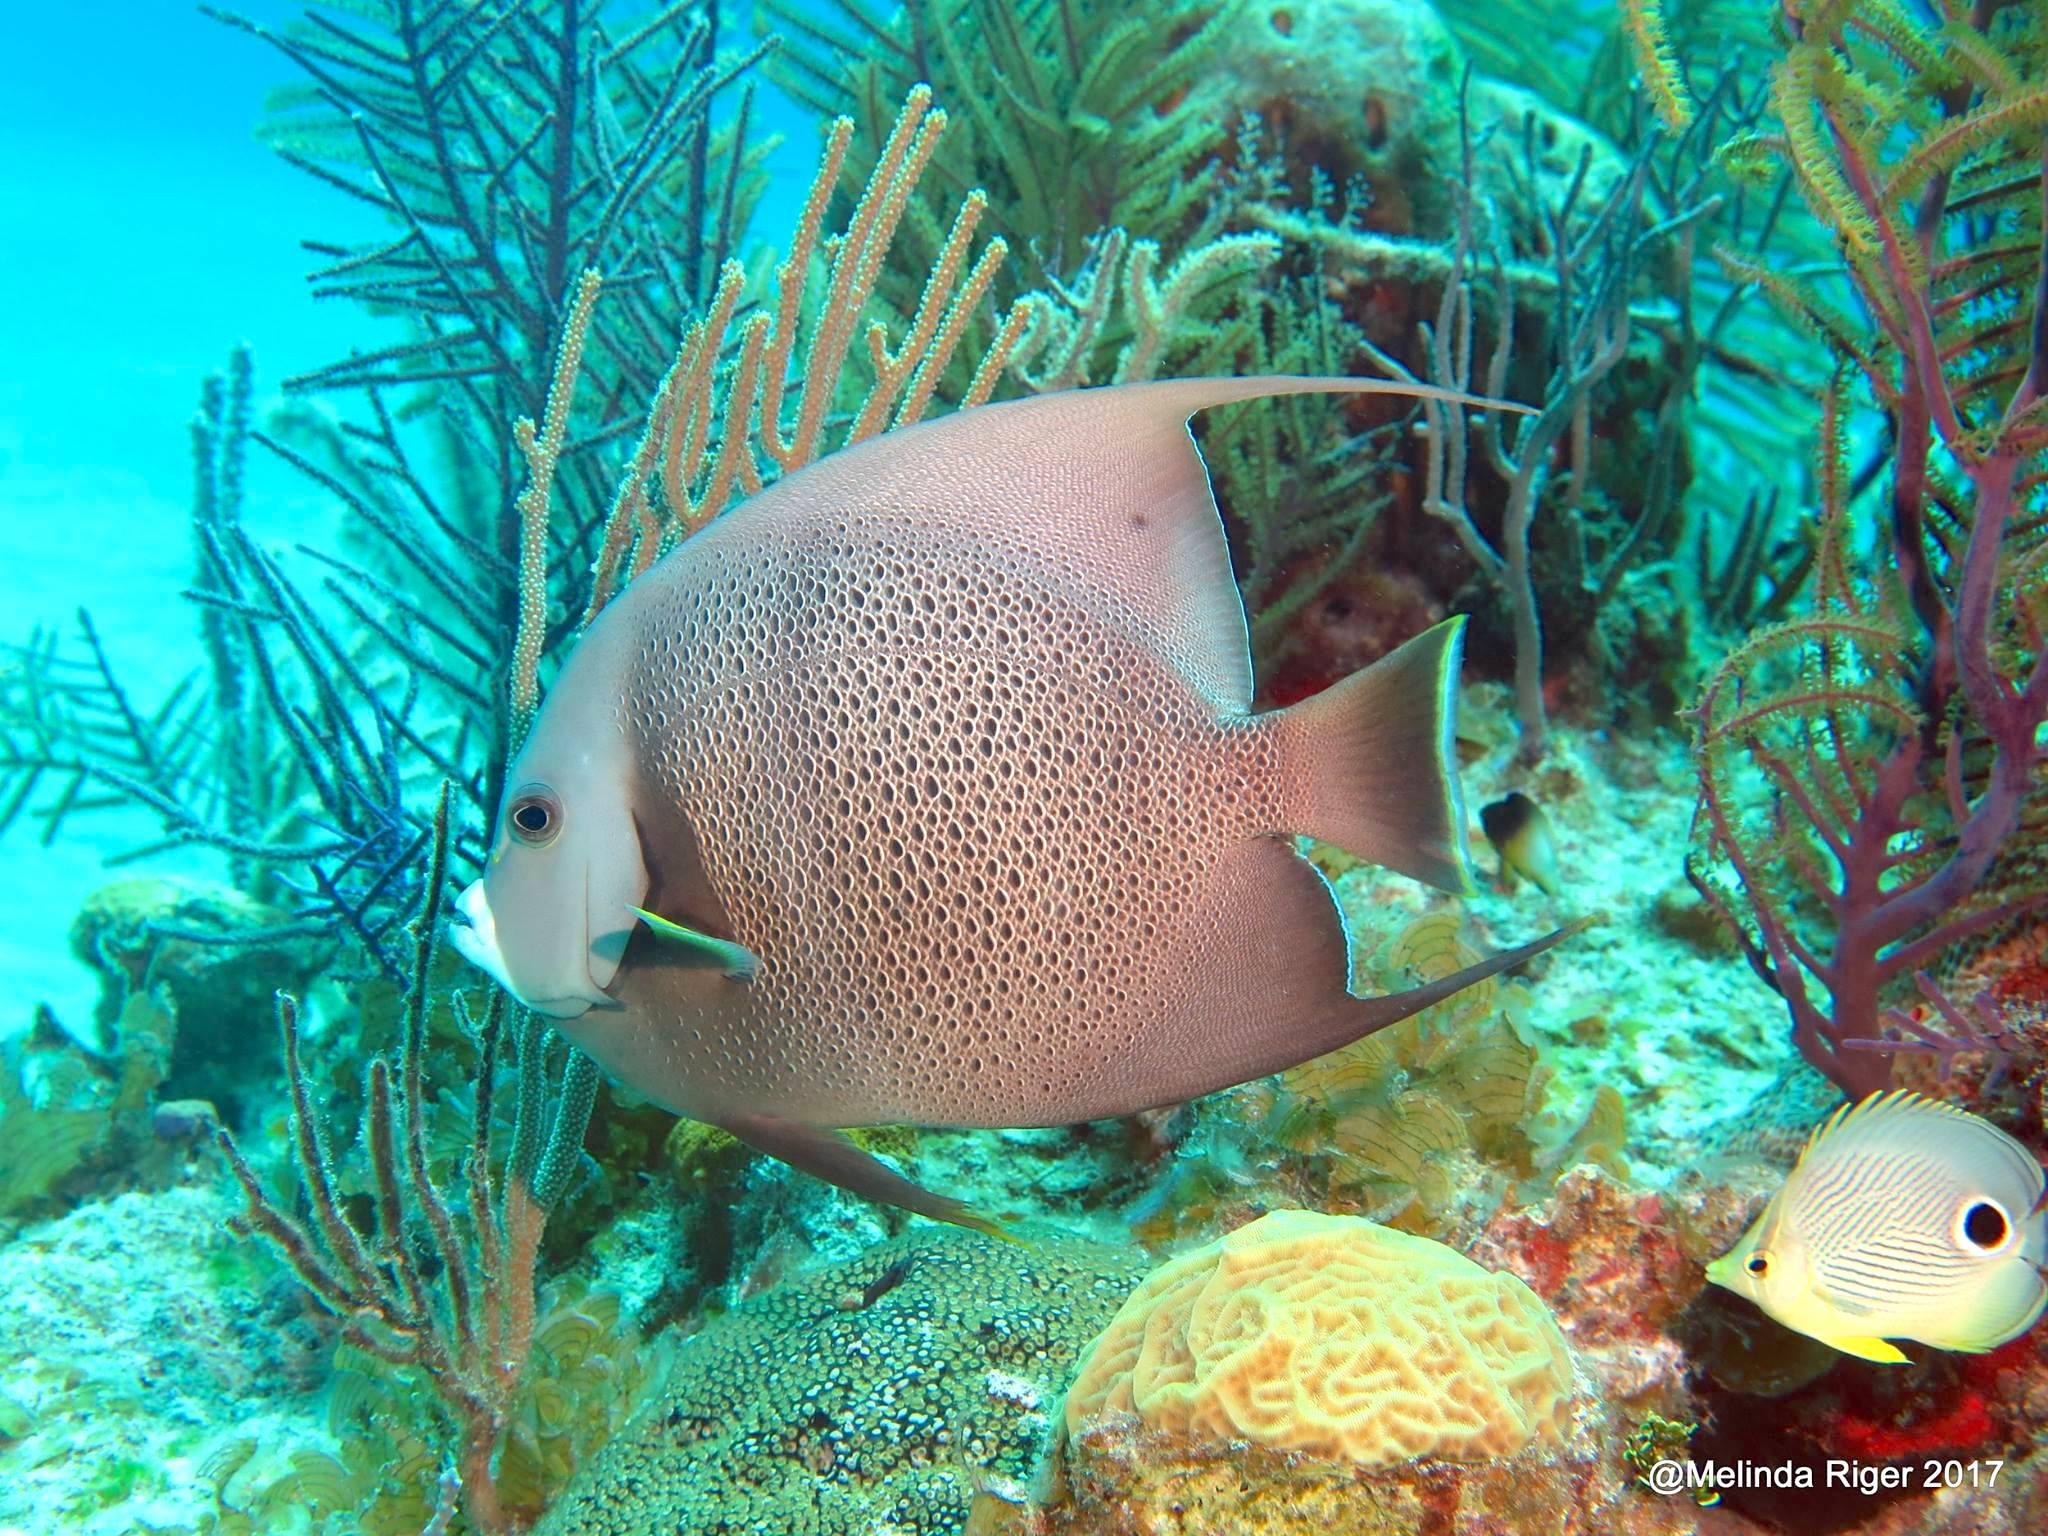 Gray Angelfish 9with four-eyed butterflyfish), Bahamas (Melinda Riger / Grand Bahama Scuba)